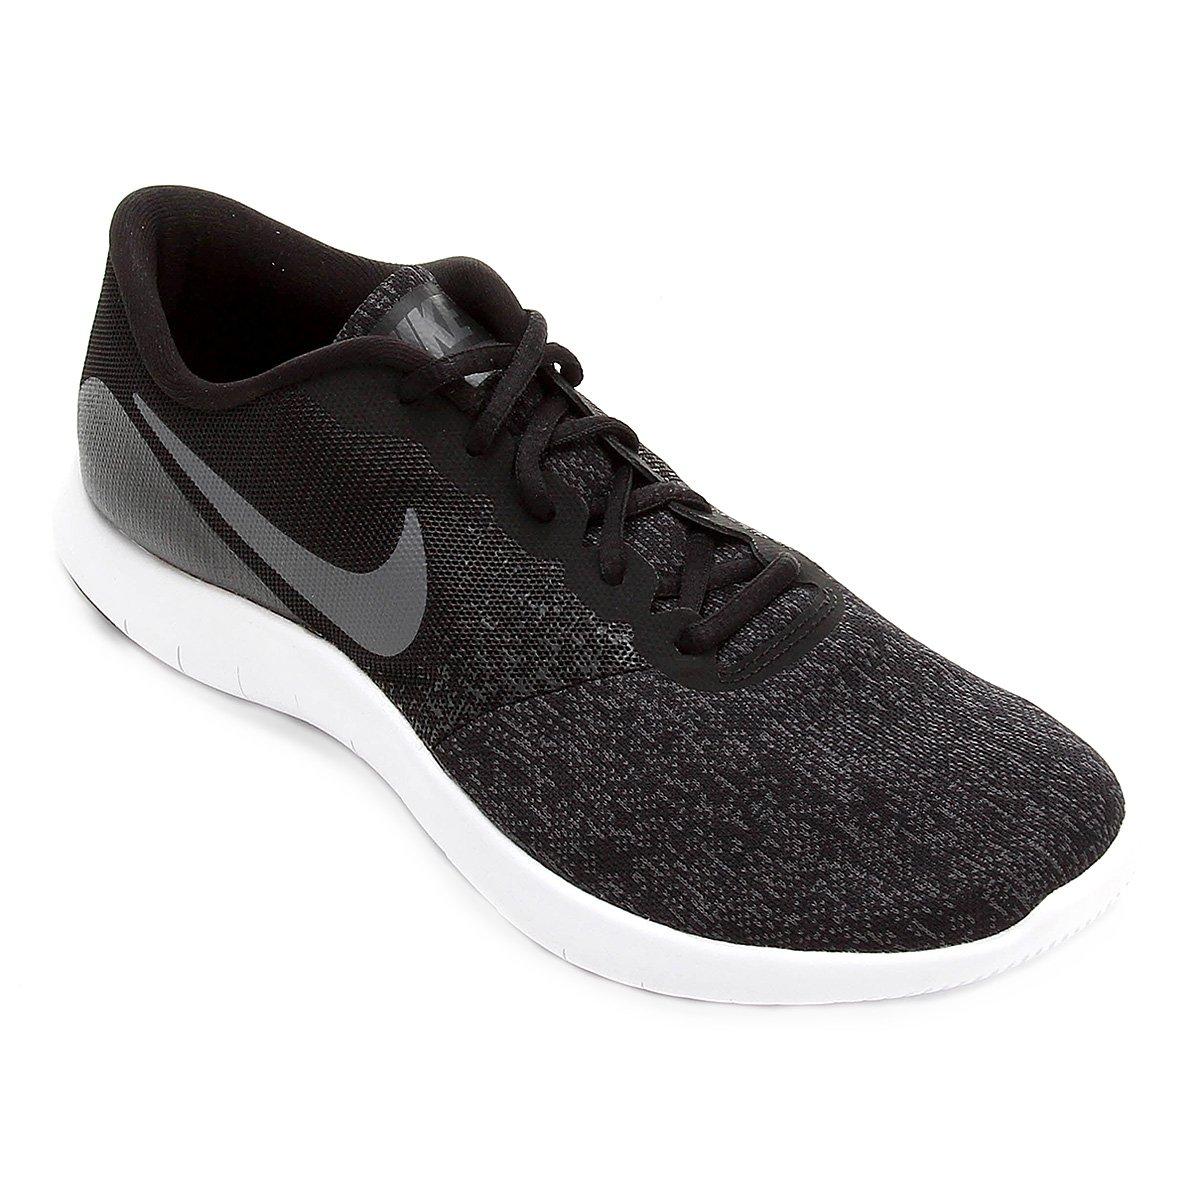 Tênis Nike Flex Contact Masculino - Preto e Cinza | Netshoes